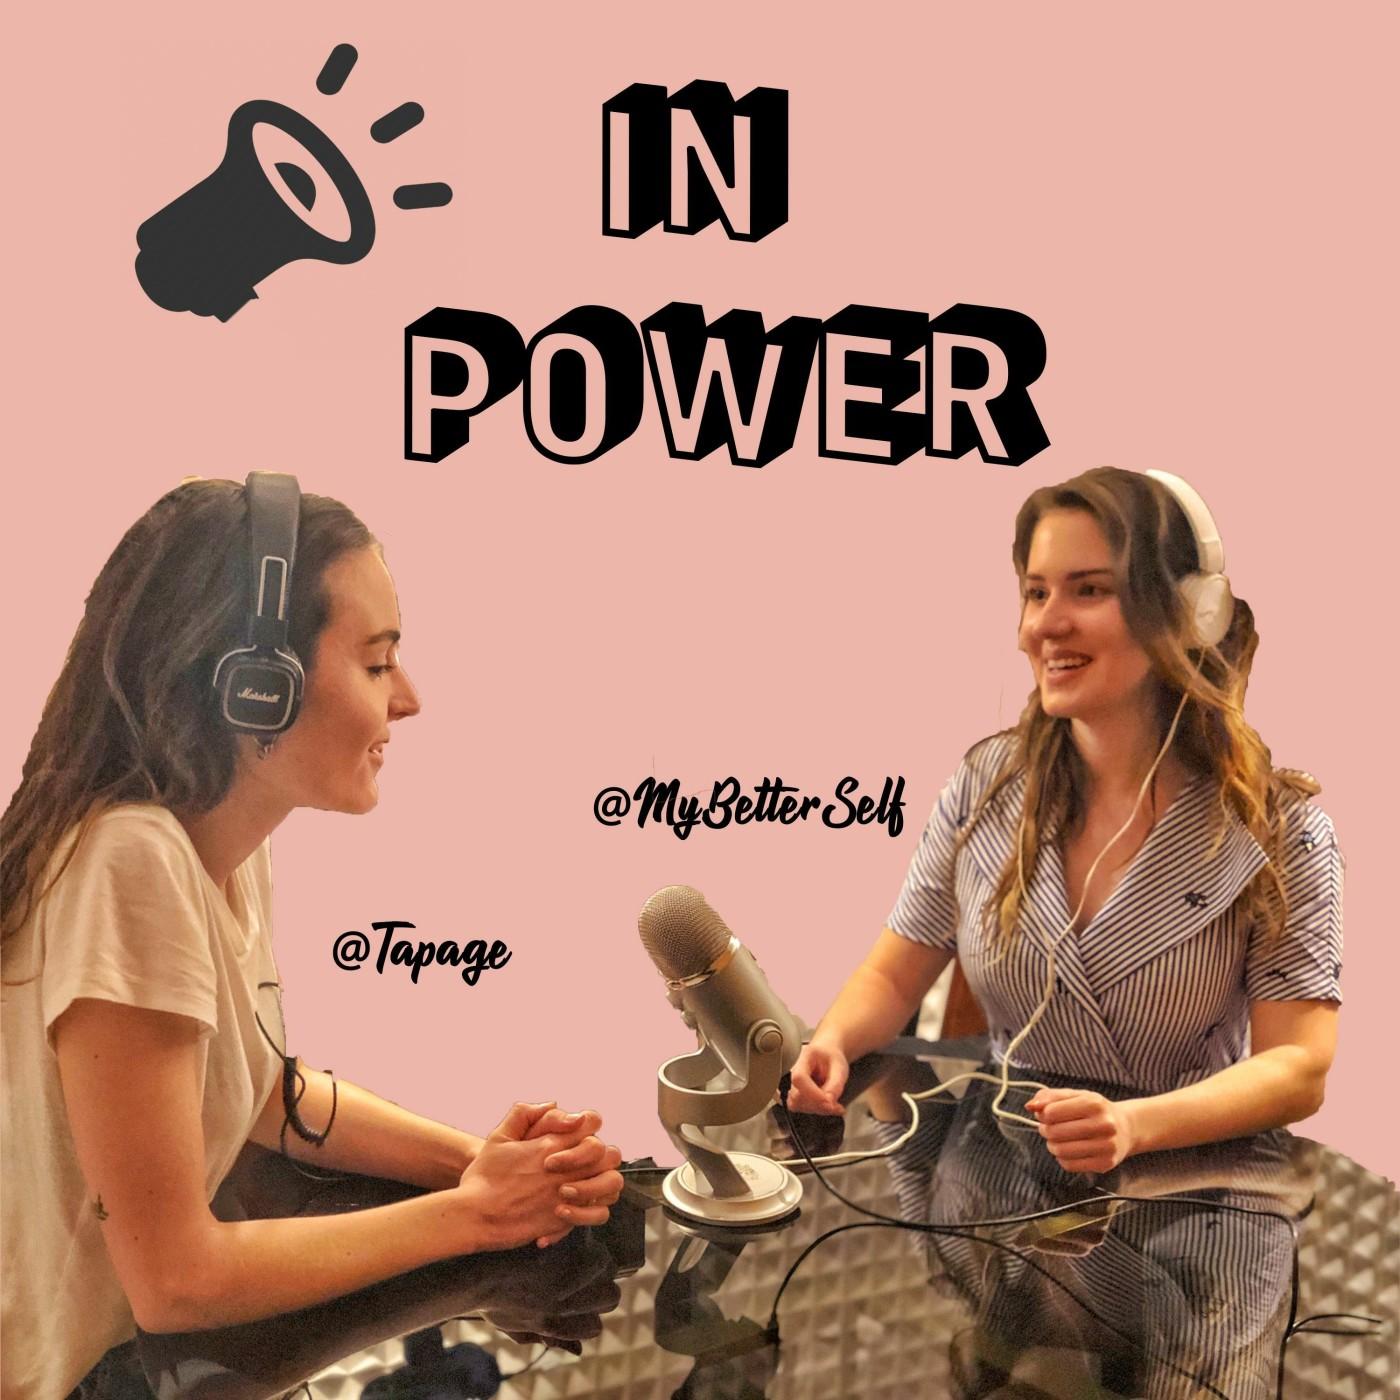 Episode 1 - In Power